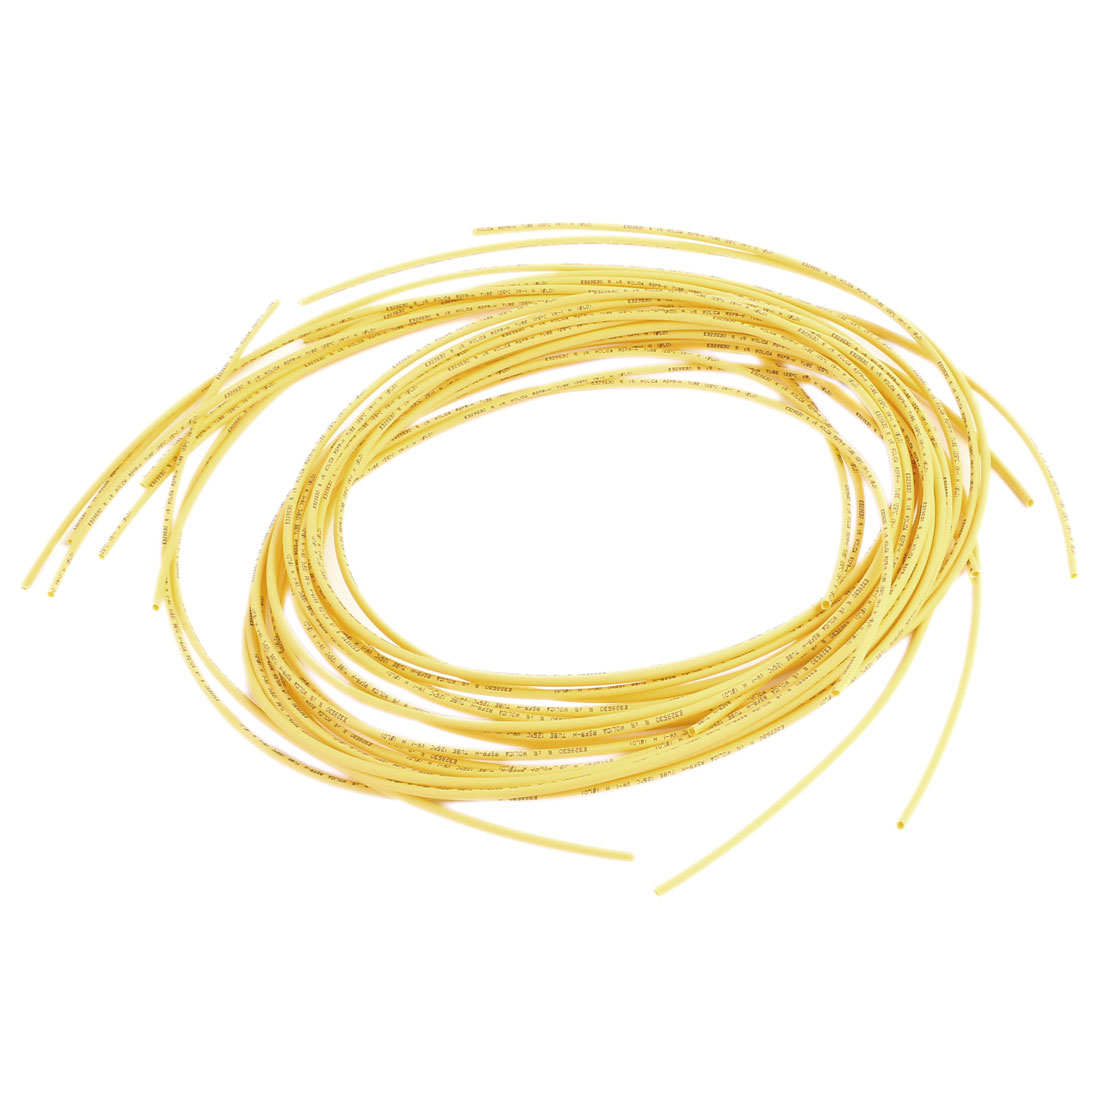 1M 1mm Dia Polyolefin Heat Shrinking Shrinkable Tubing Tubes Yellow 10pcs